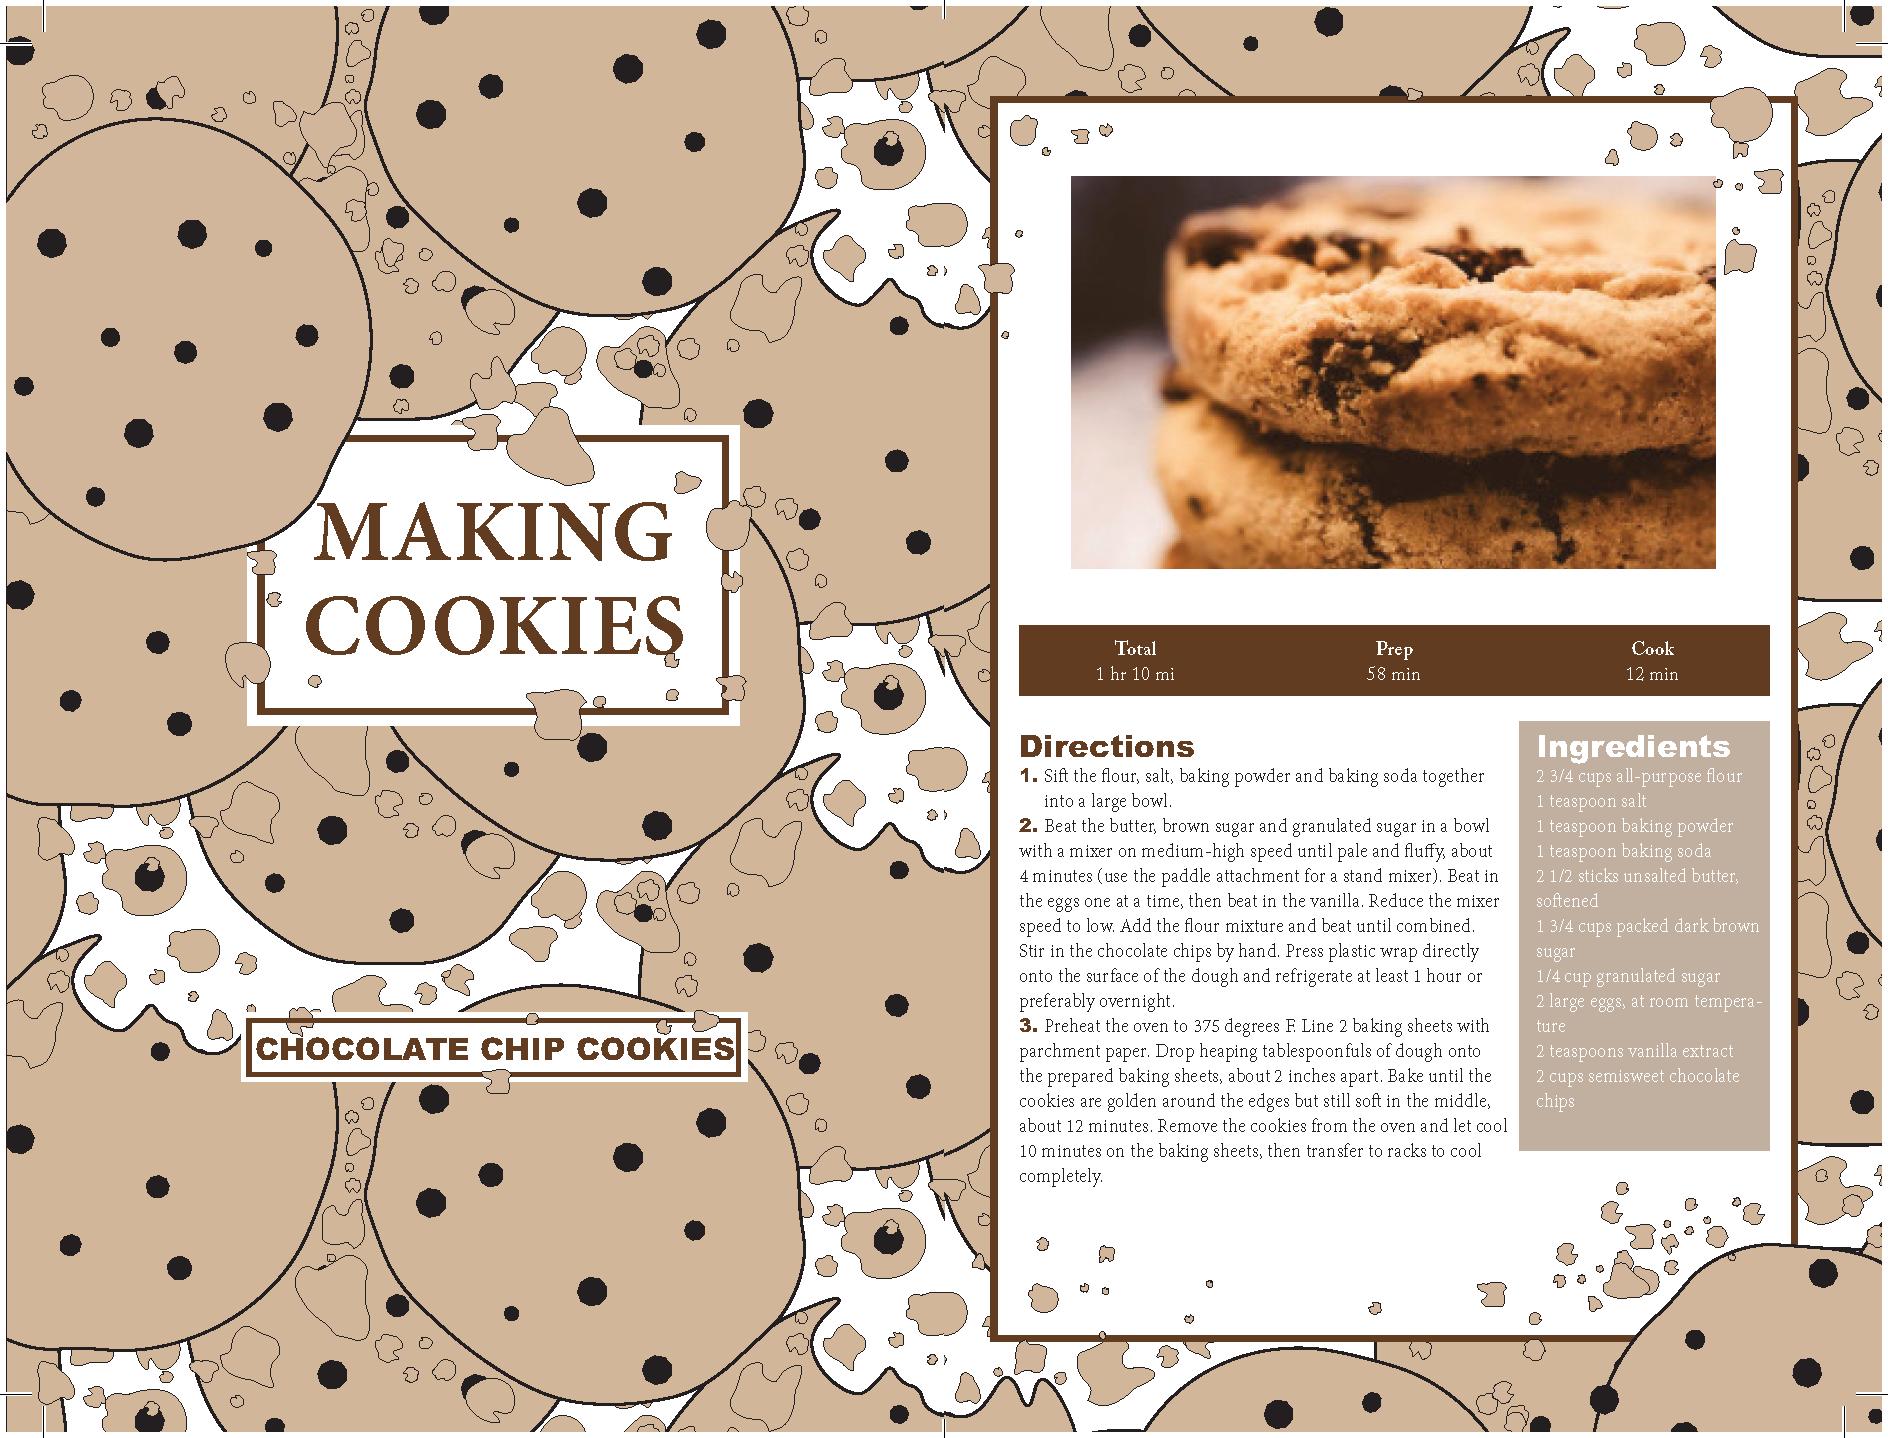 Mattapcookie Project v2.0.png